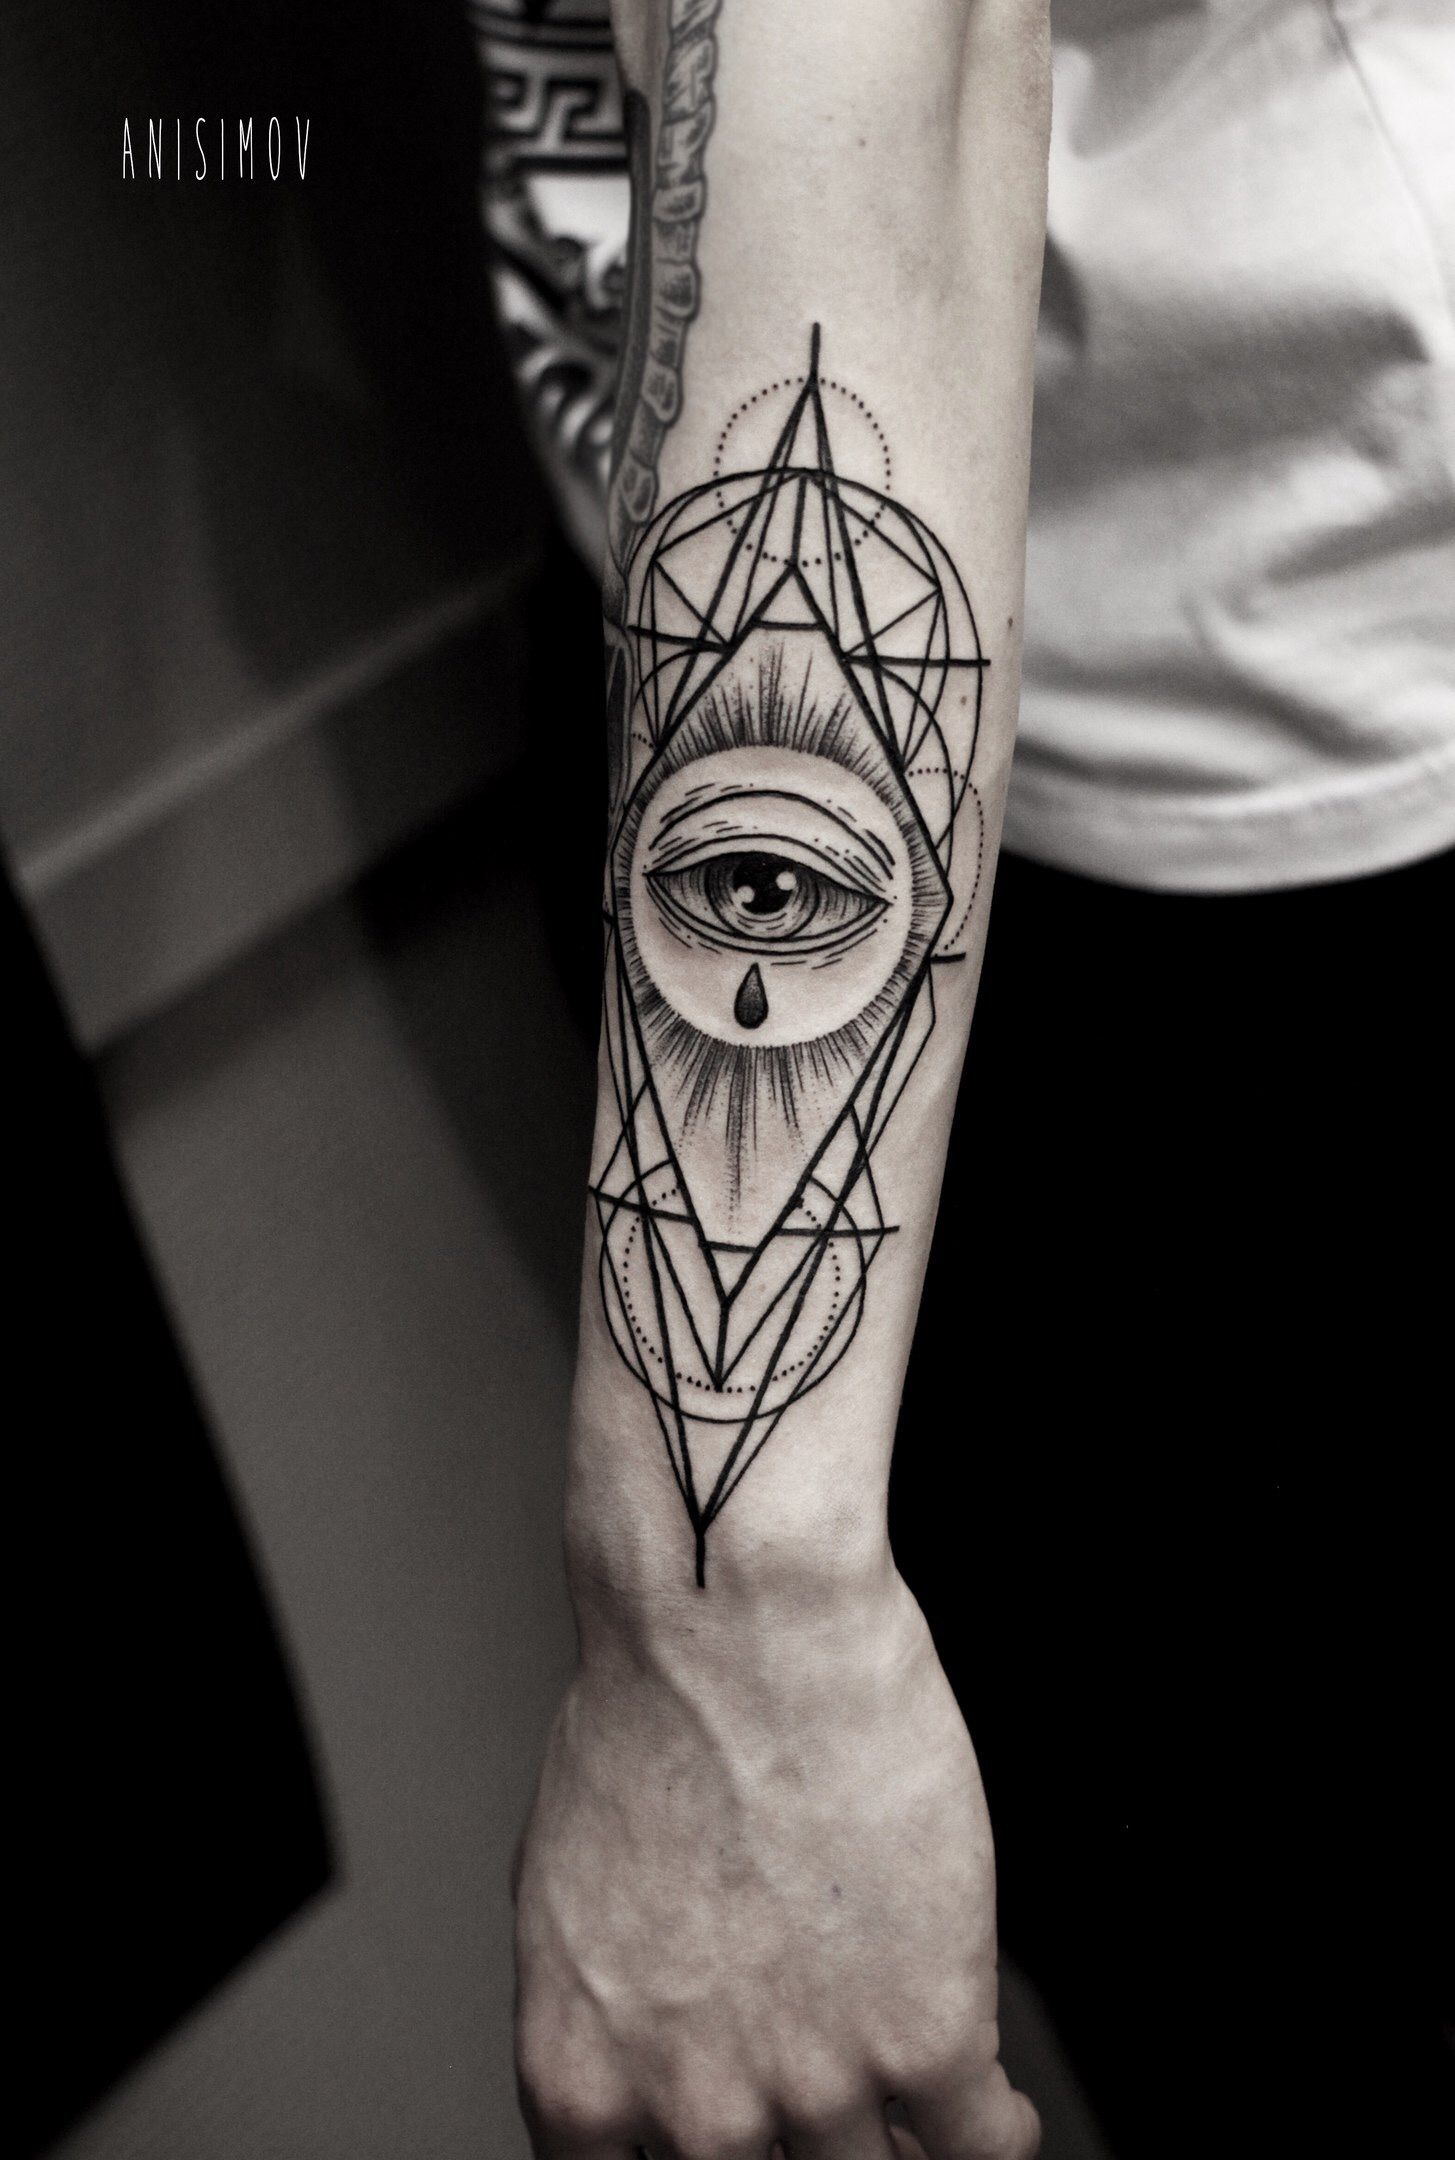 Pin By Kayla On Lisa Sleeve Tattoos All Seeing Eye Tattoo Geometric Eye Tattoo